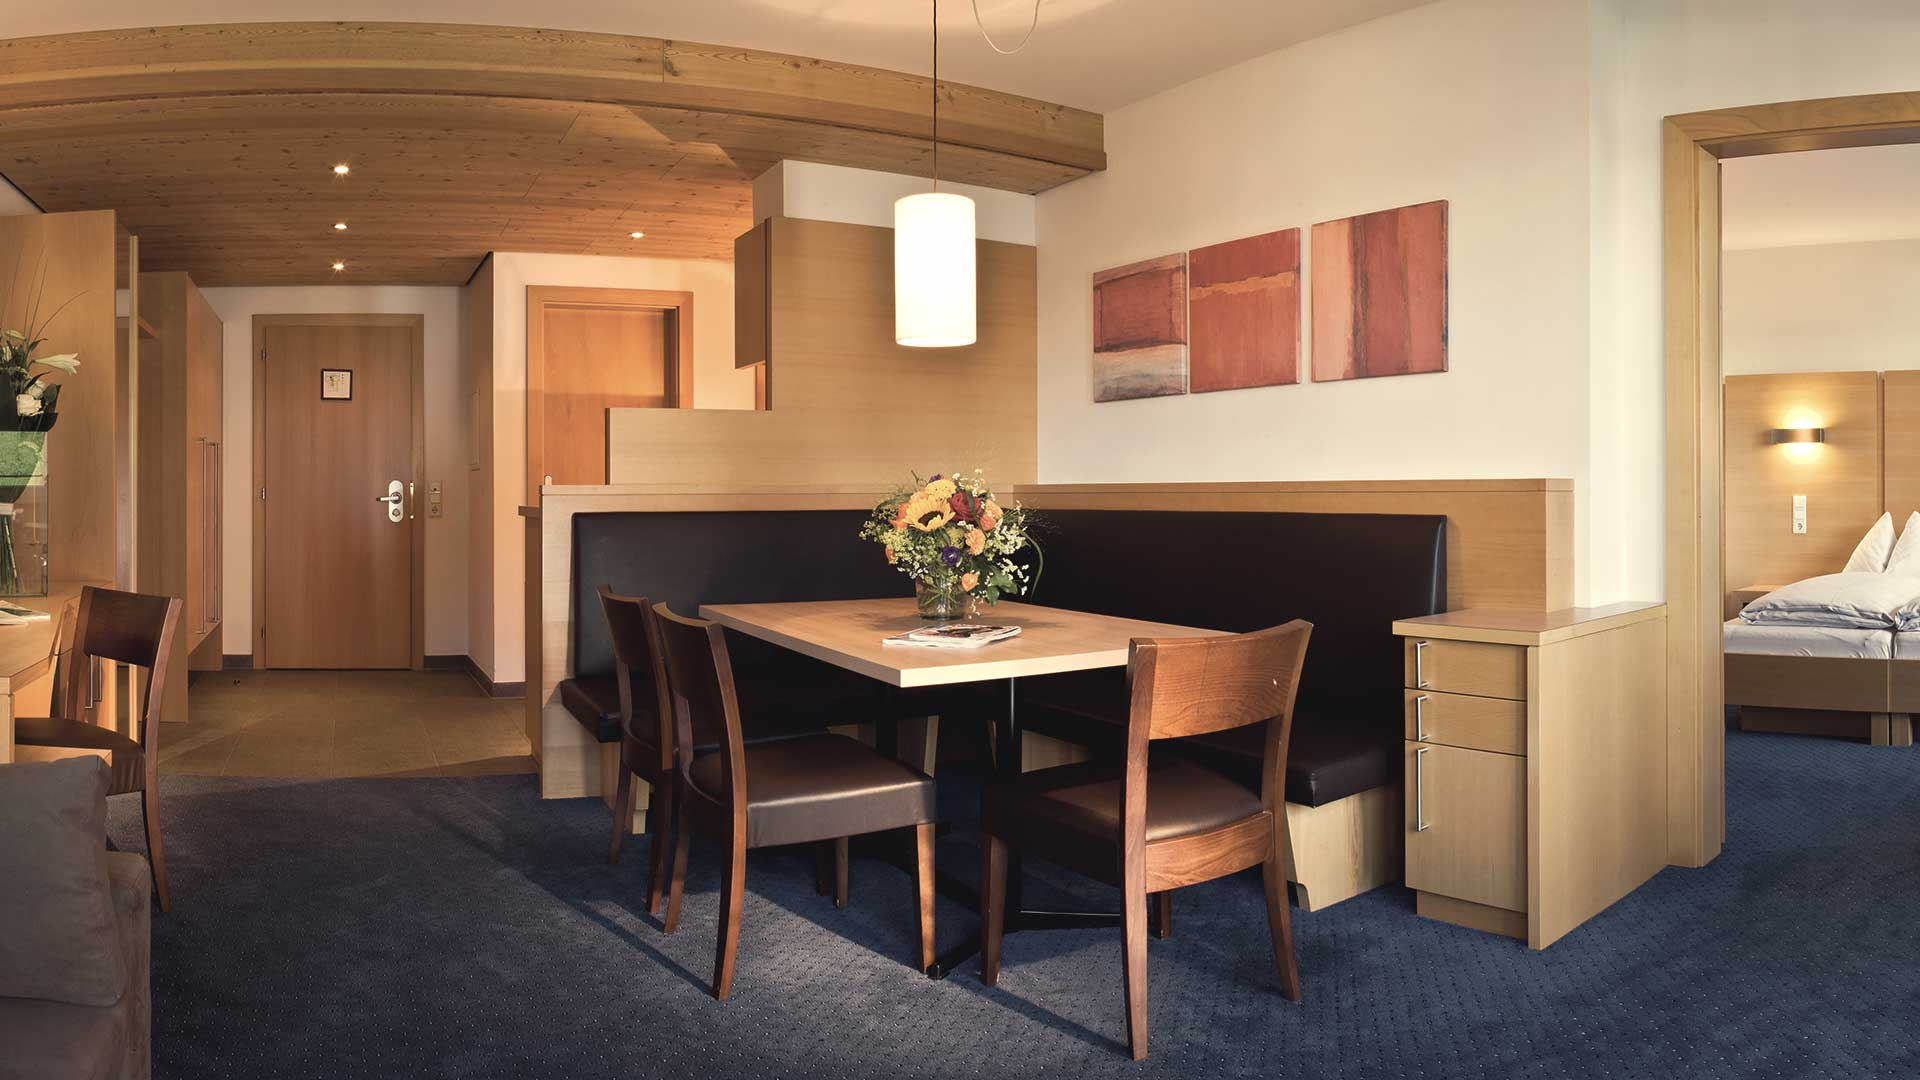 Gradiva, Lejlighed 330